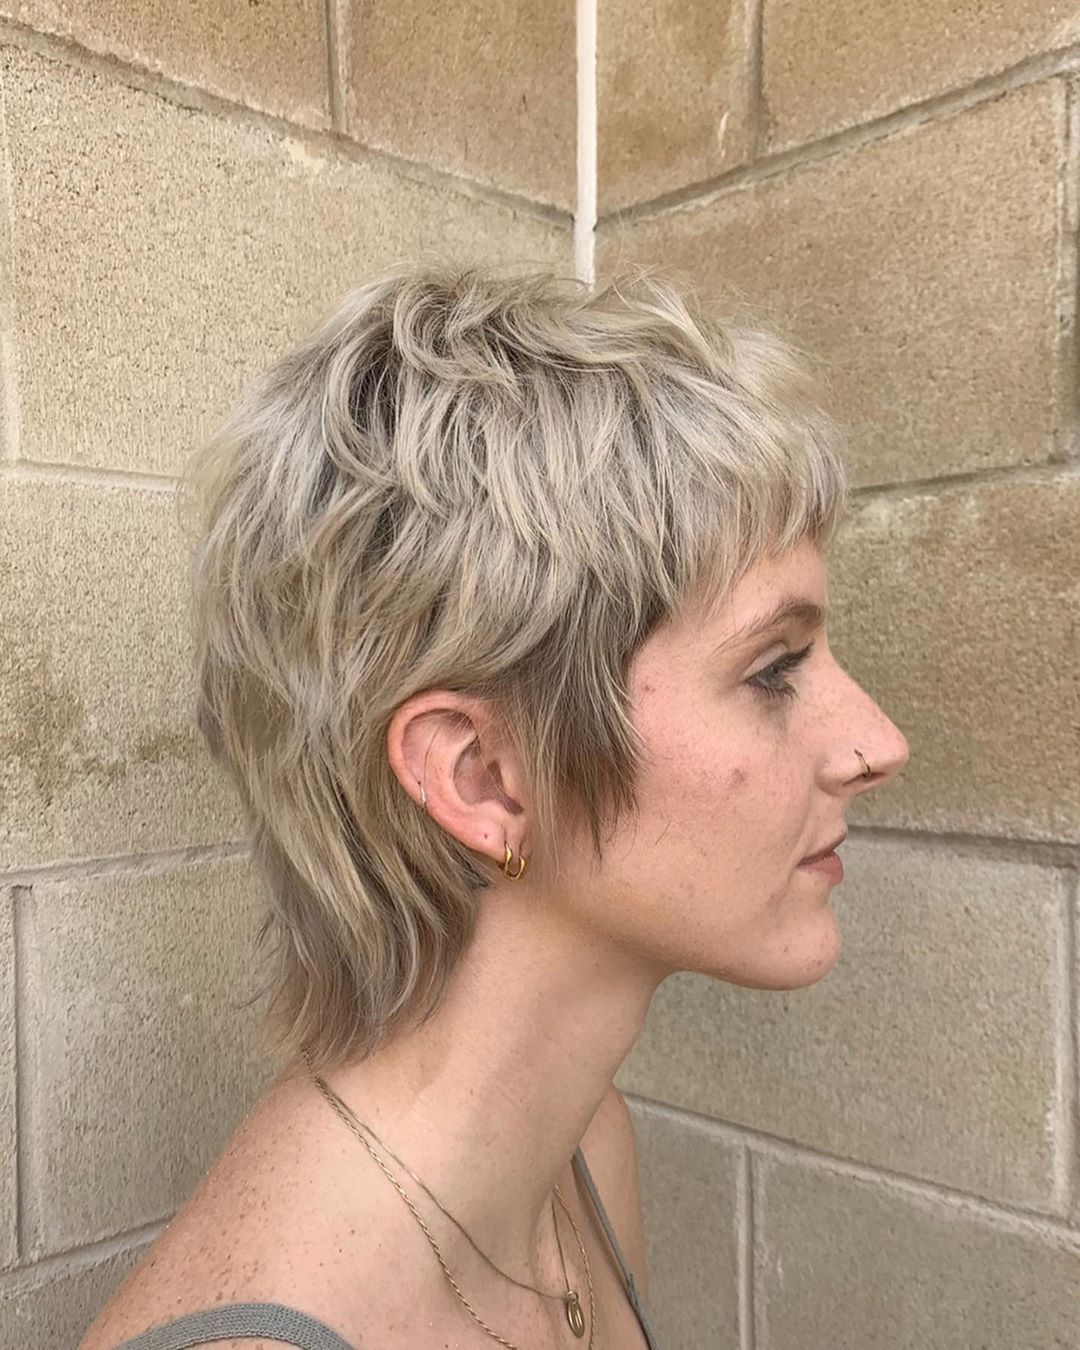 Haircut   Short grunge hair, Androgynous hair, Mullet hairstyle